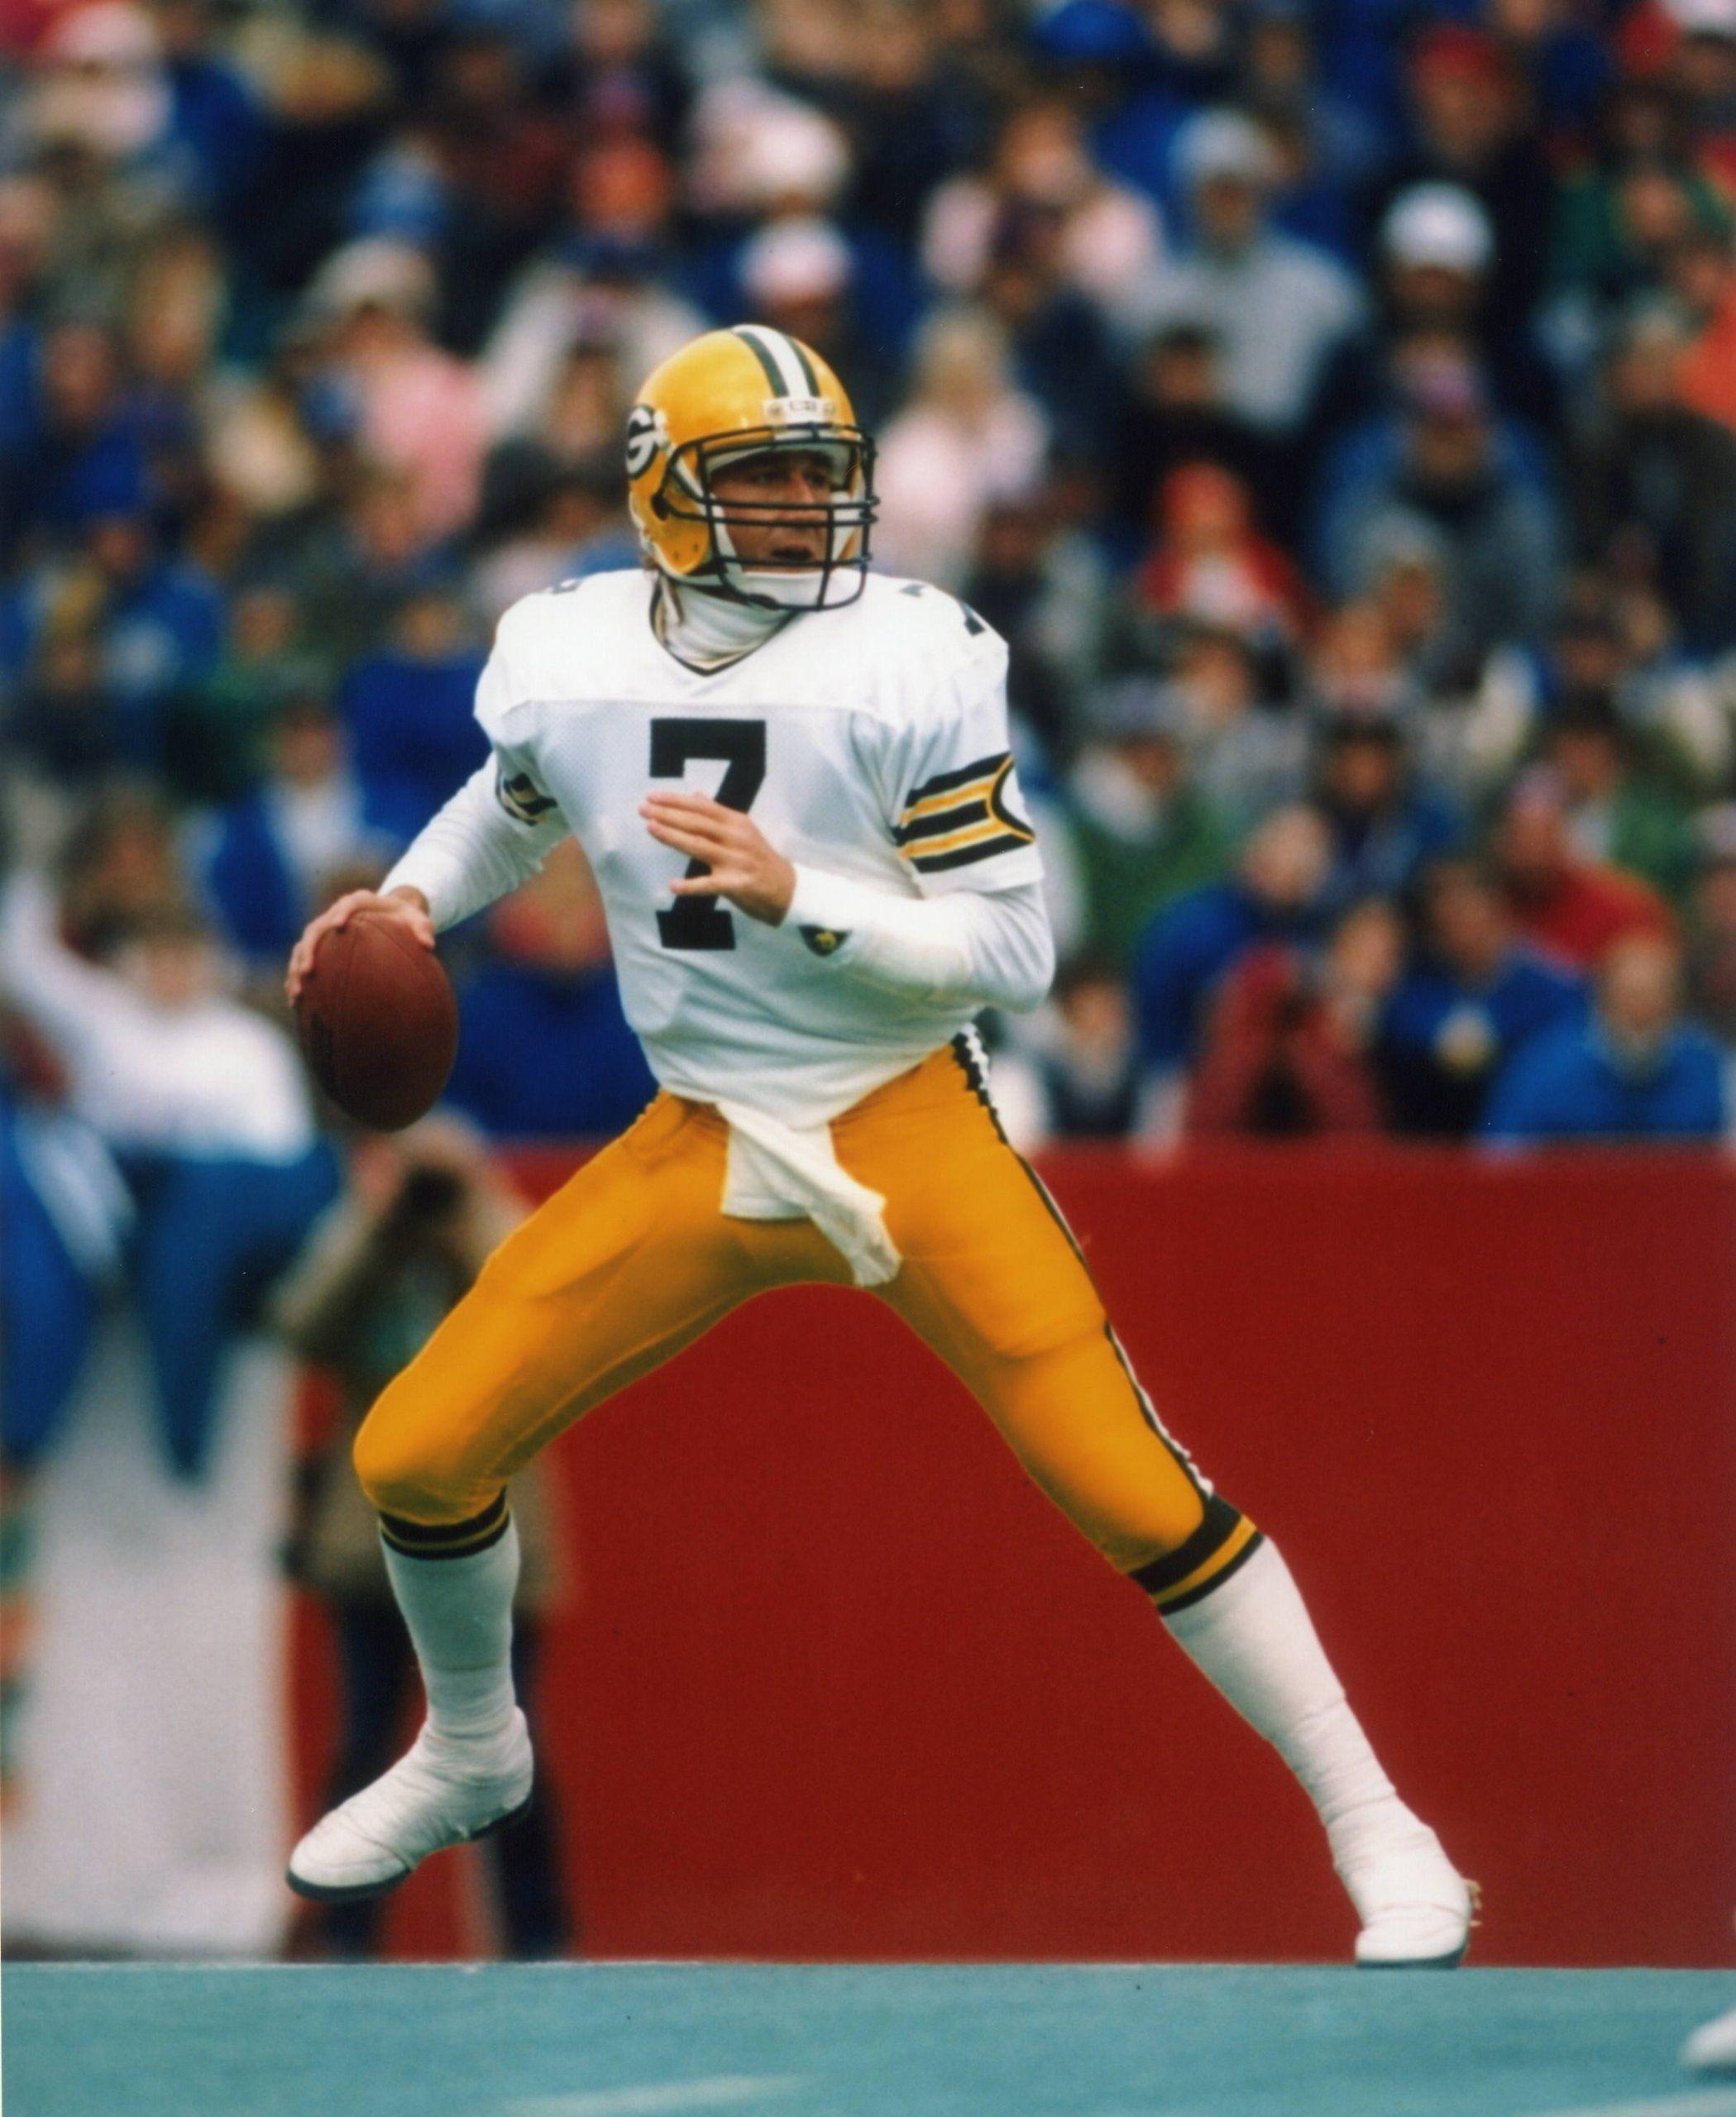 Amazon Com Don Majkowski Green Bay Packers 8x10 Sports Action Photo F Sports Fan P Green Bay Packers History Green Bay Packers Football Green Bay Packers